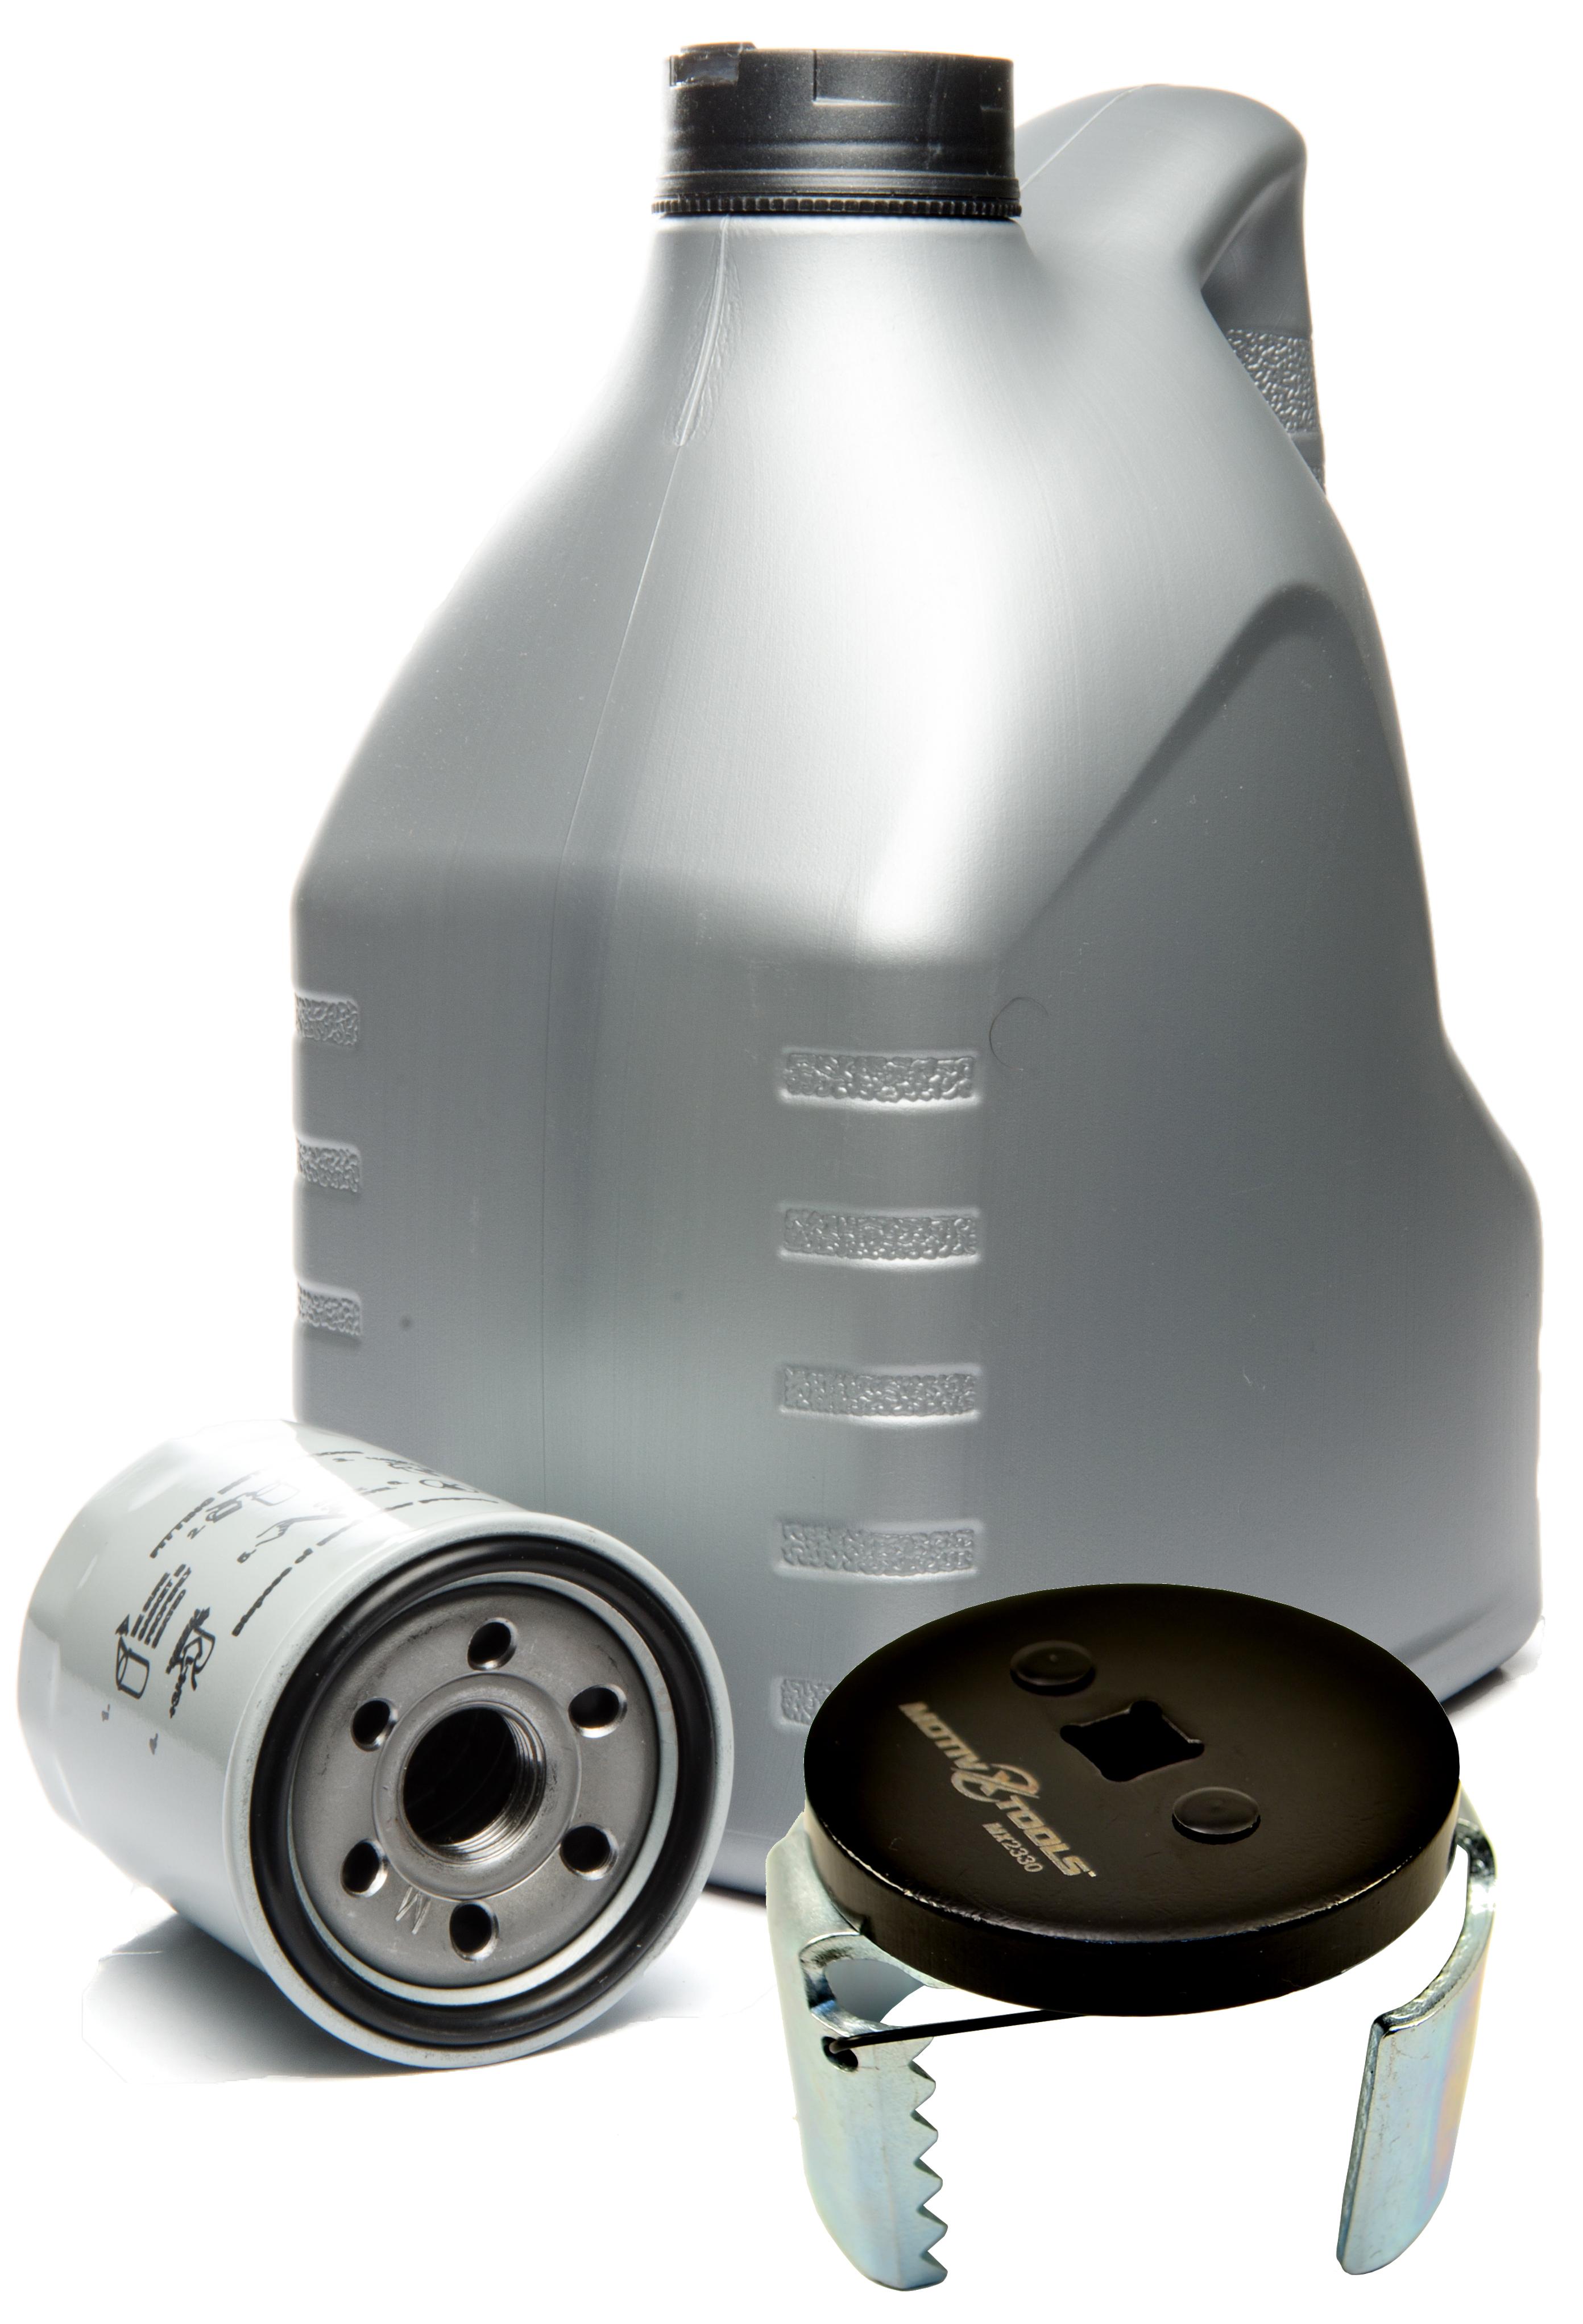 universal oil filter wrench for removing 2 5. Black Bedroom Furniture Sets. Home Design Ideas